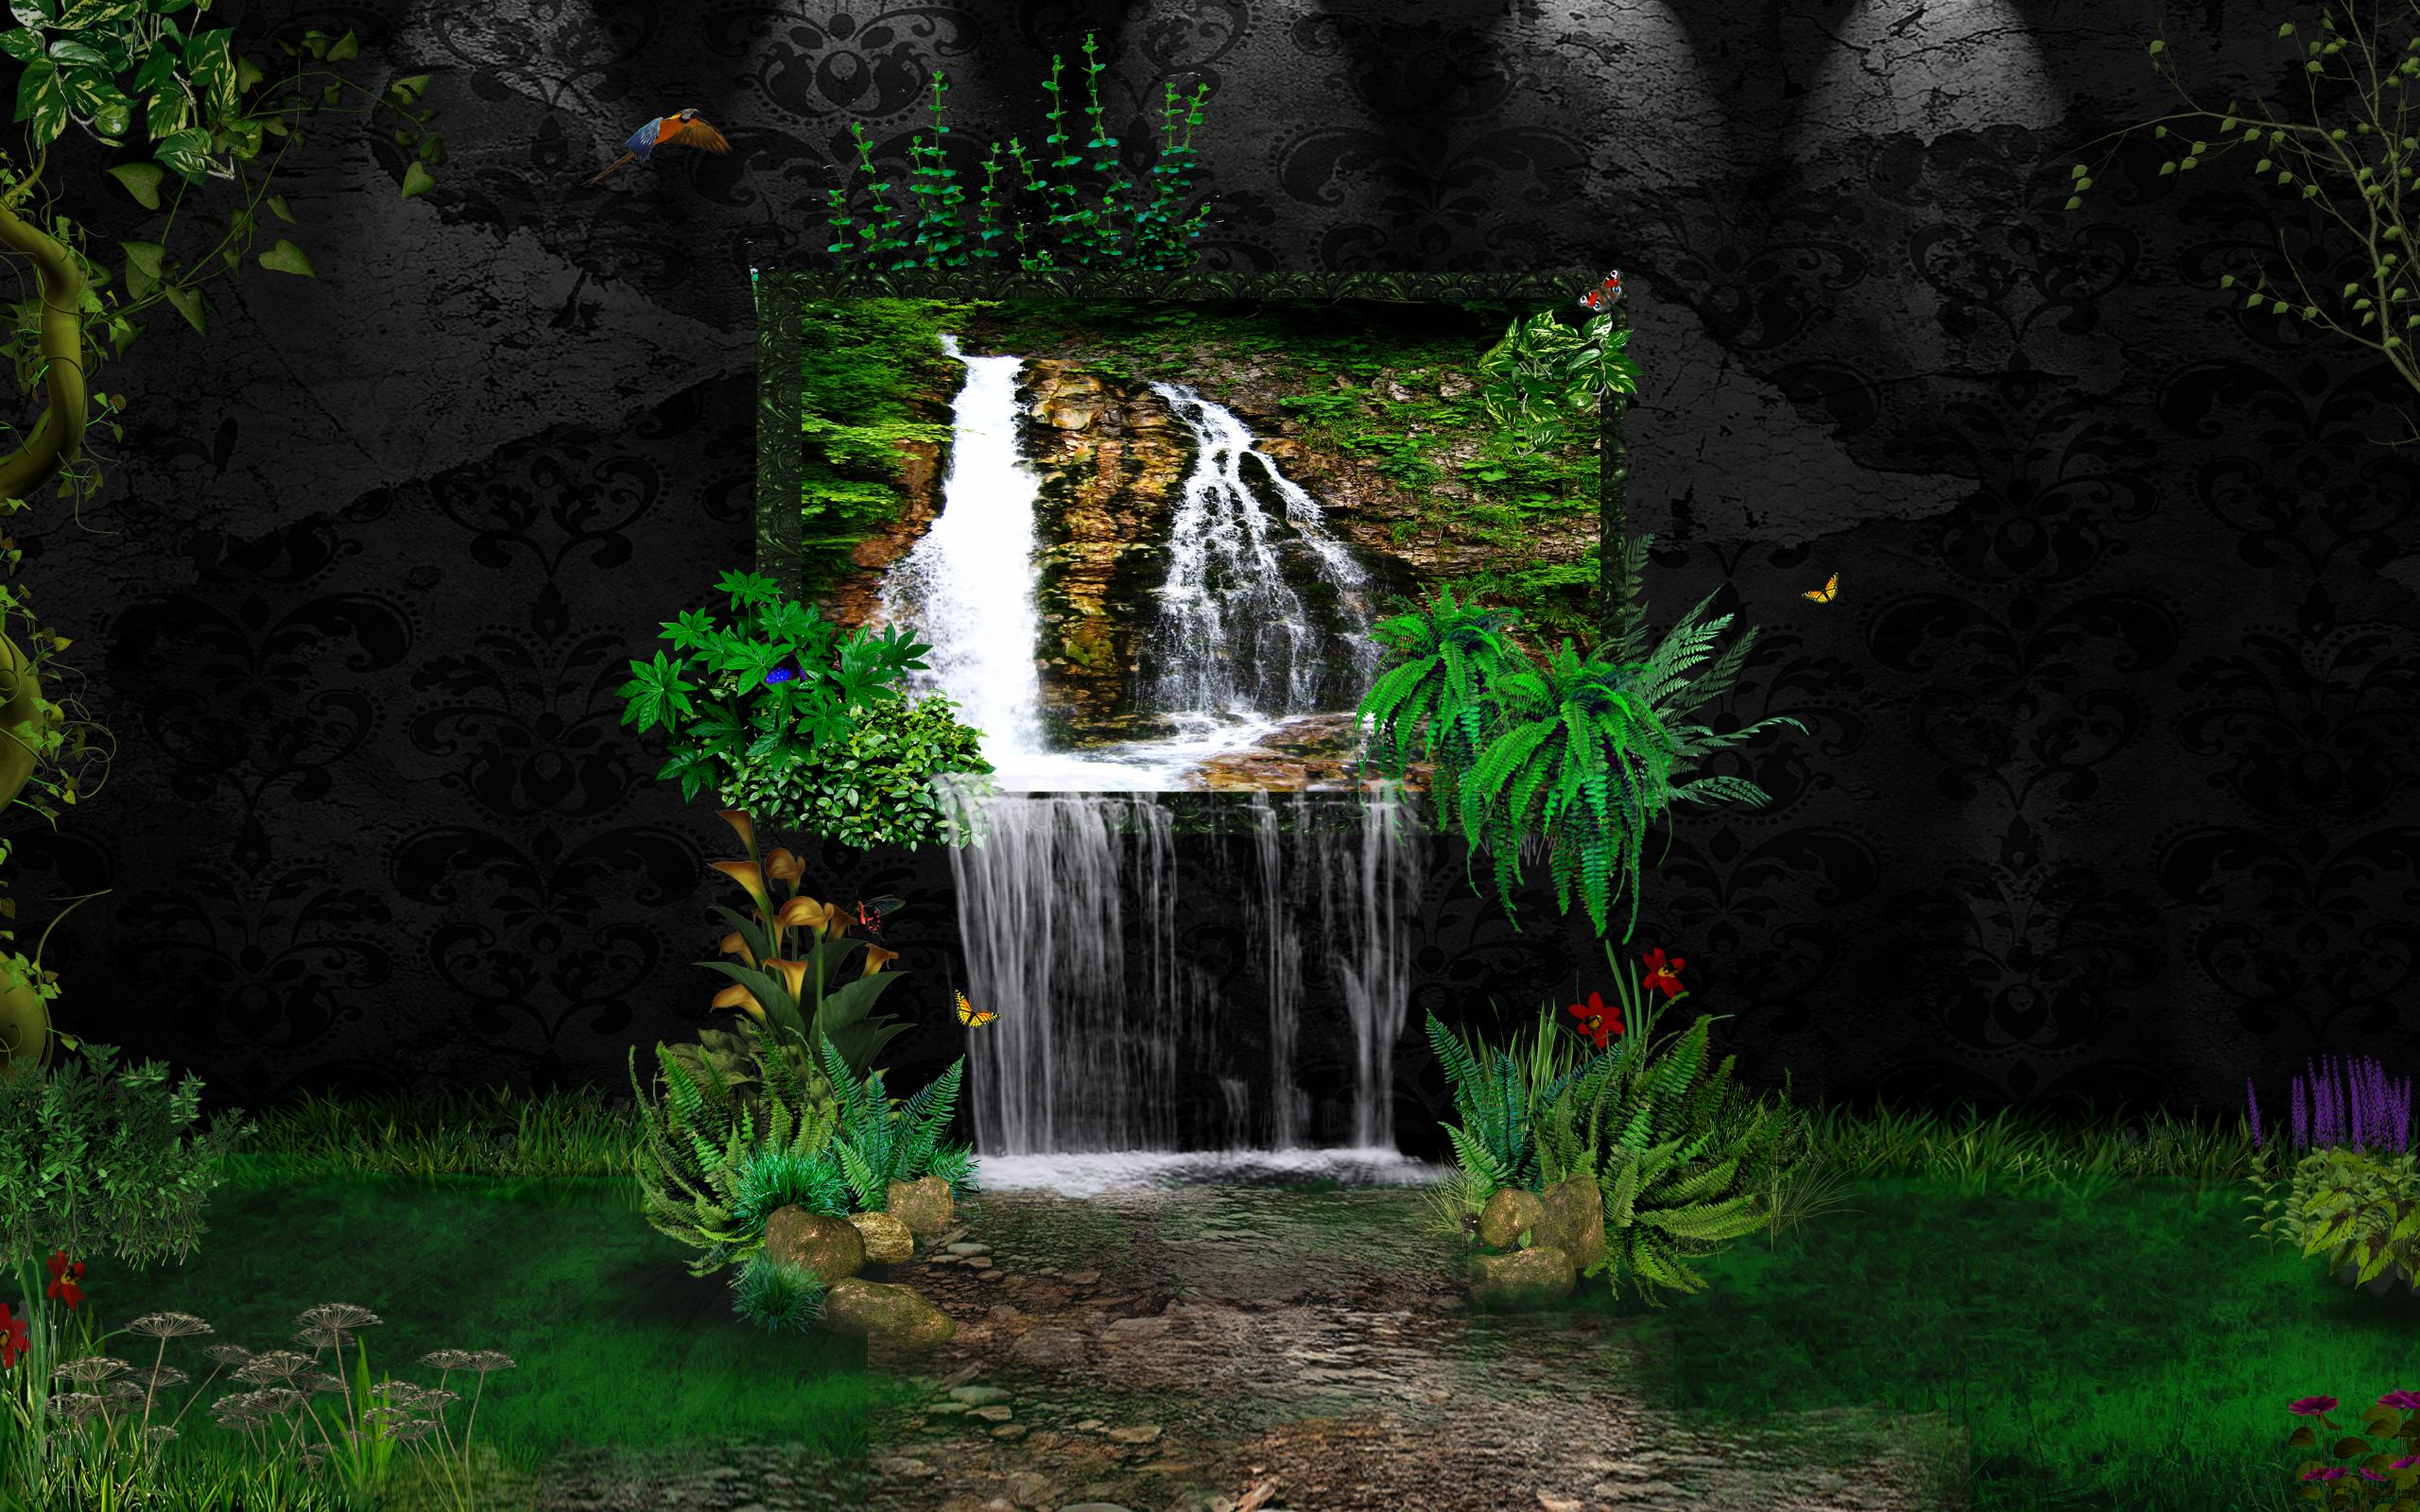 nature background wallpaper - photo #4